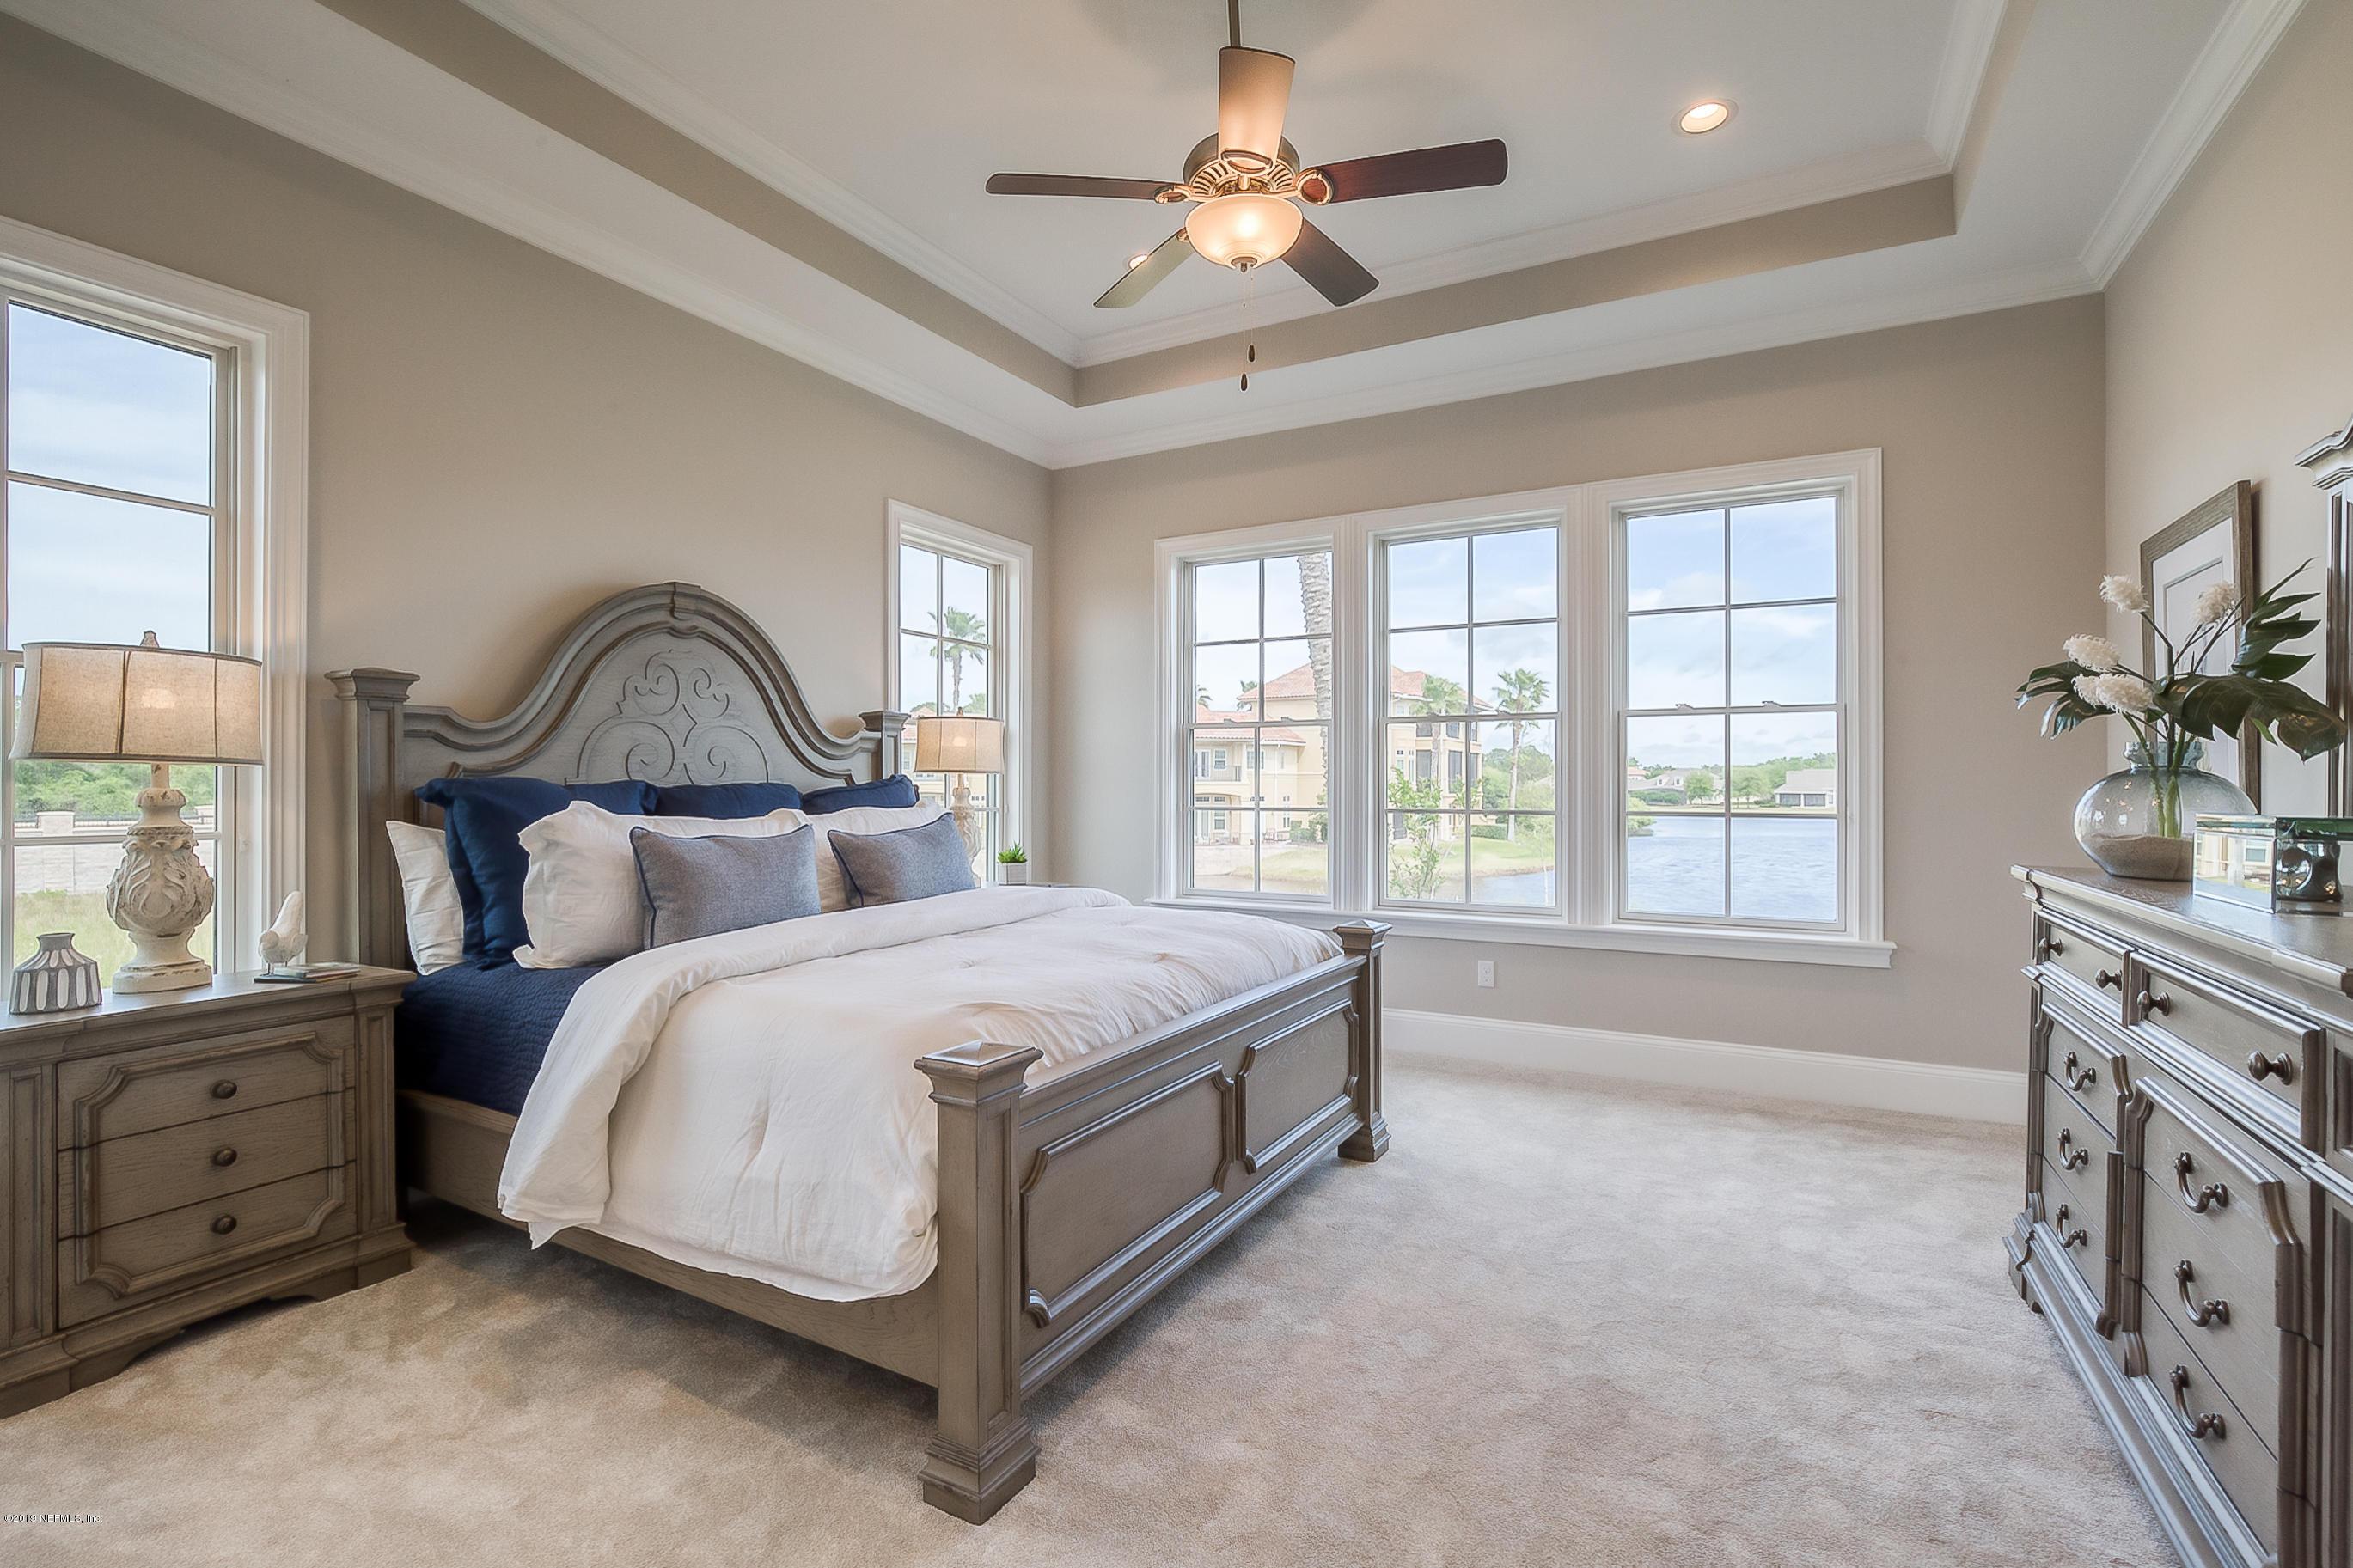 719 PROMENADE POINTE, ST AUGUSTINE, FLORIDA 32095, 4 Bedrooms Bedrooms, ,4 BathroomsBathrooms,Residential - single family,For sale,PROMENADE POINTE,988052